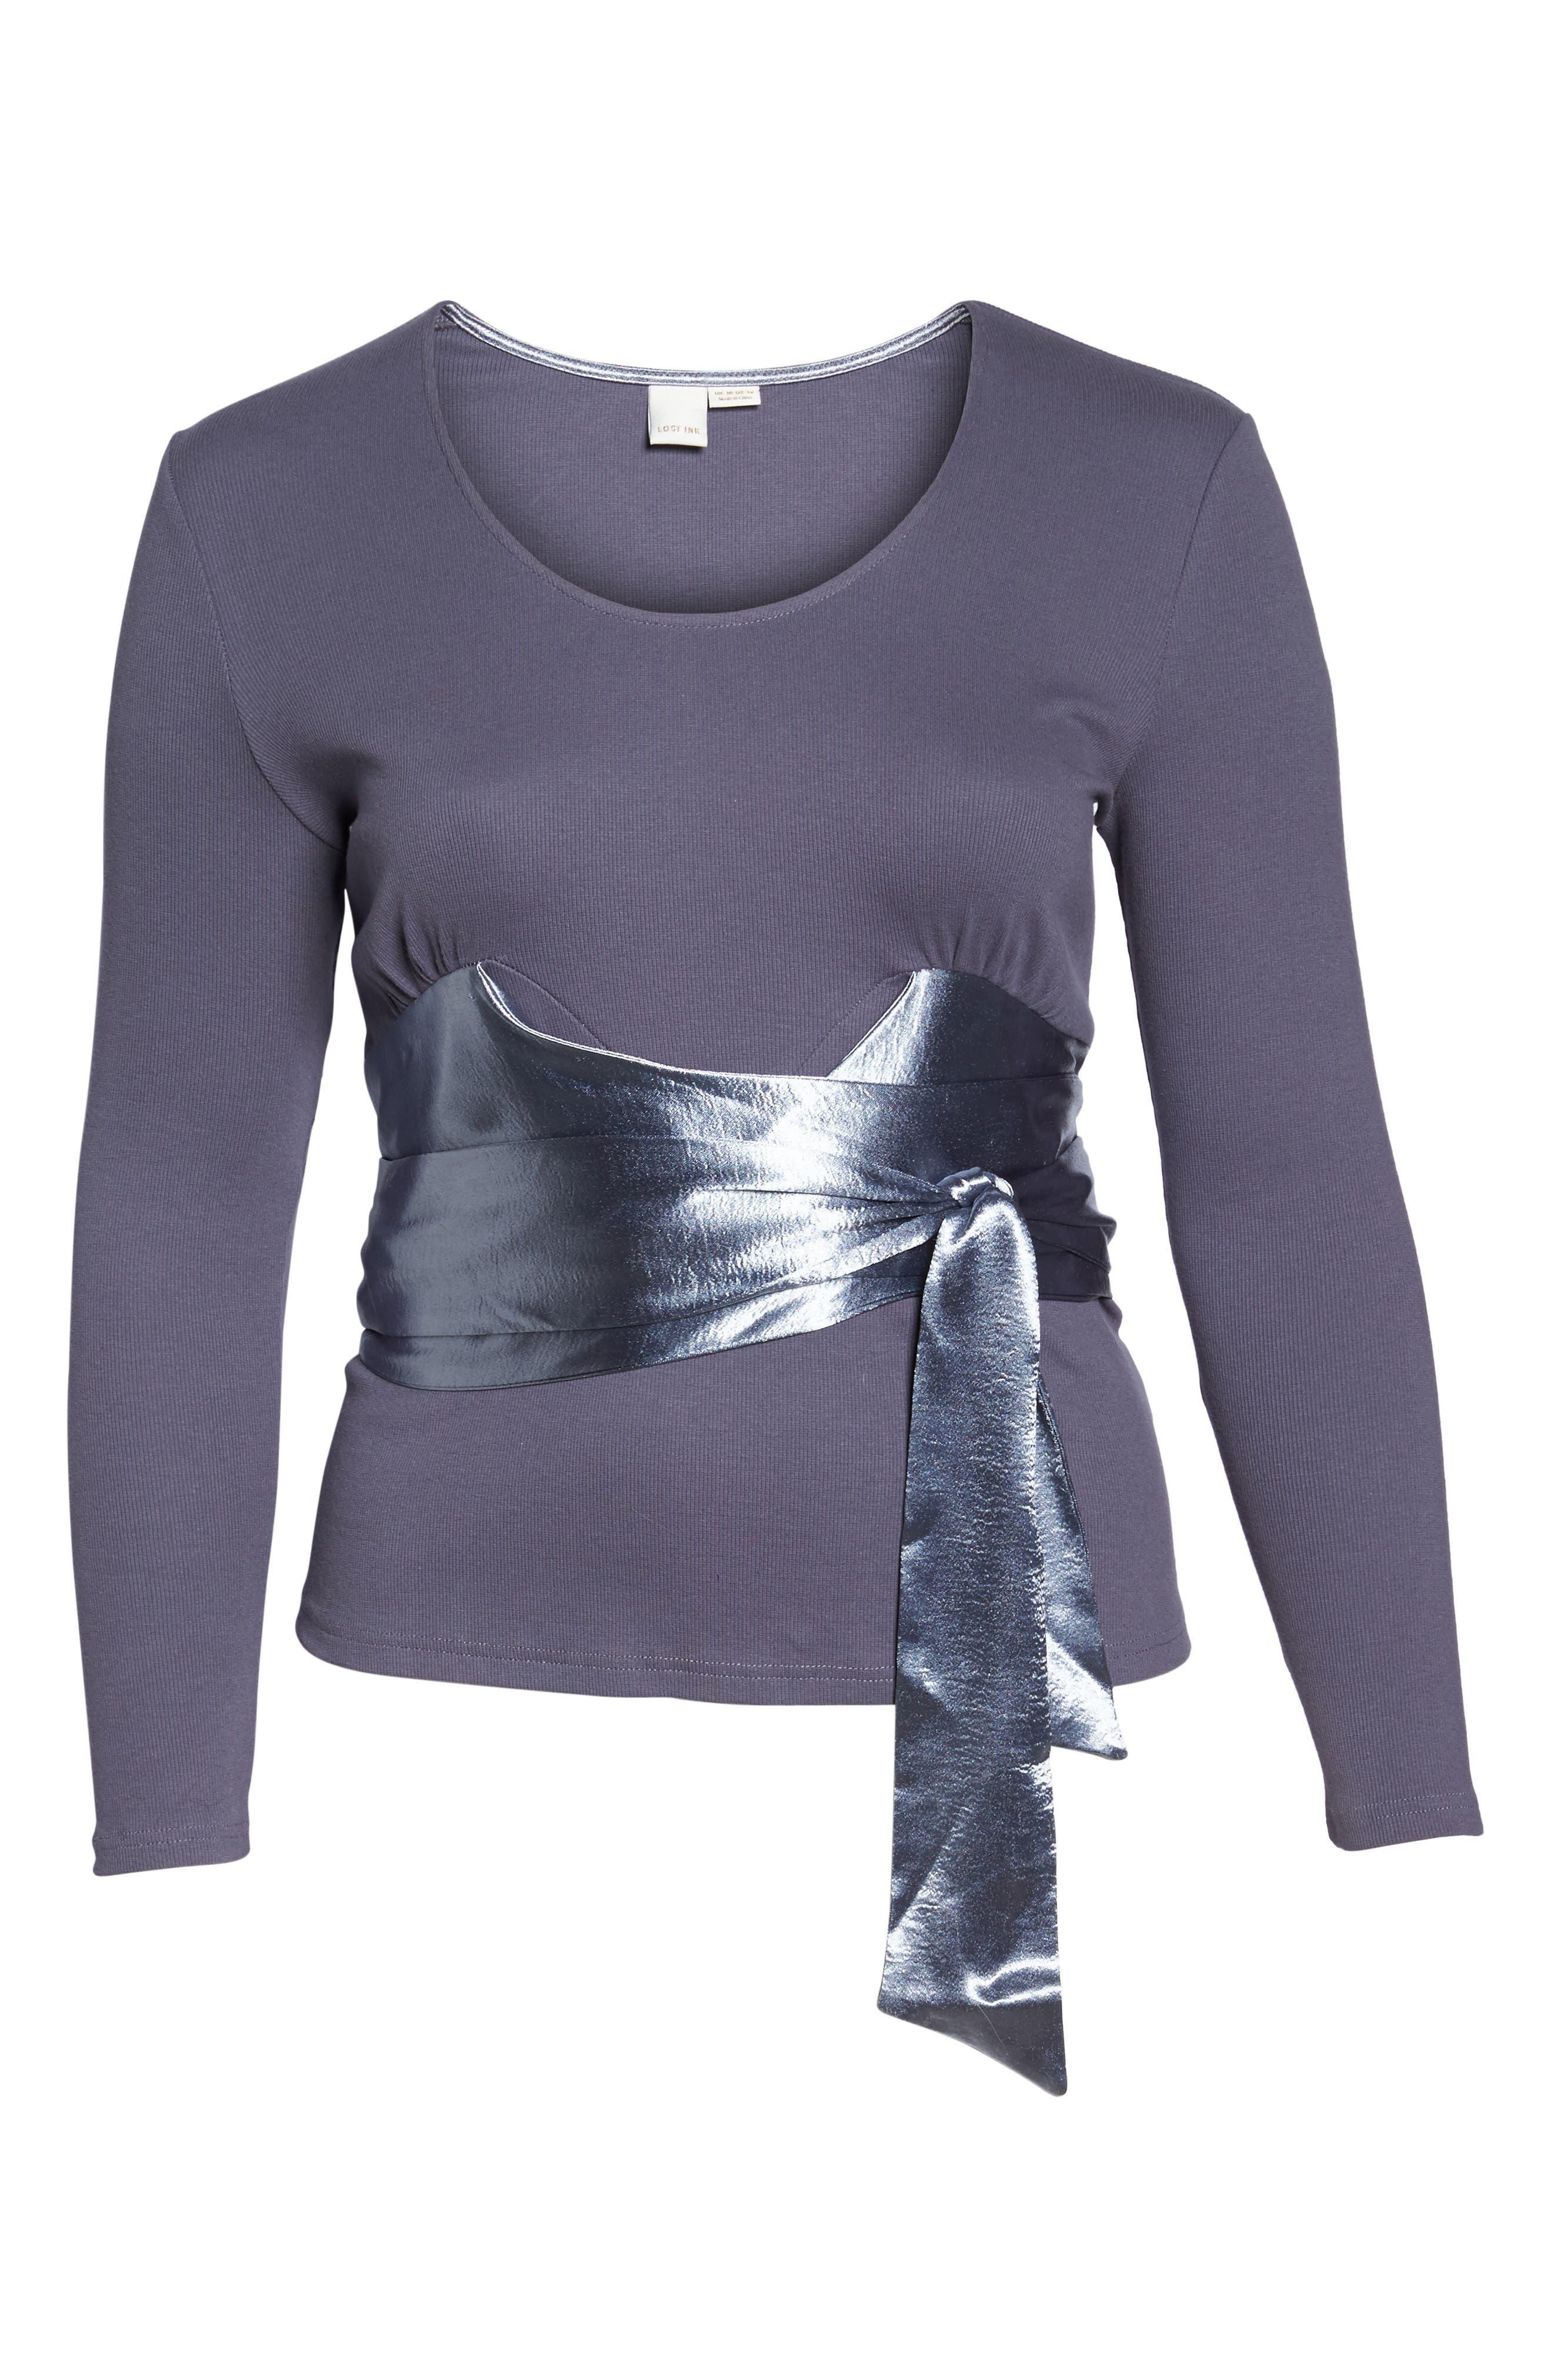 Satin Sash Knit Top,                             Alternate thumbnail 6, color,                             Grey